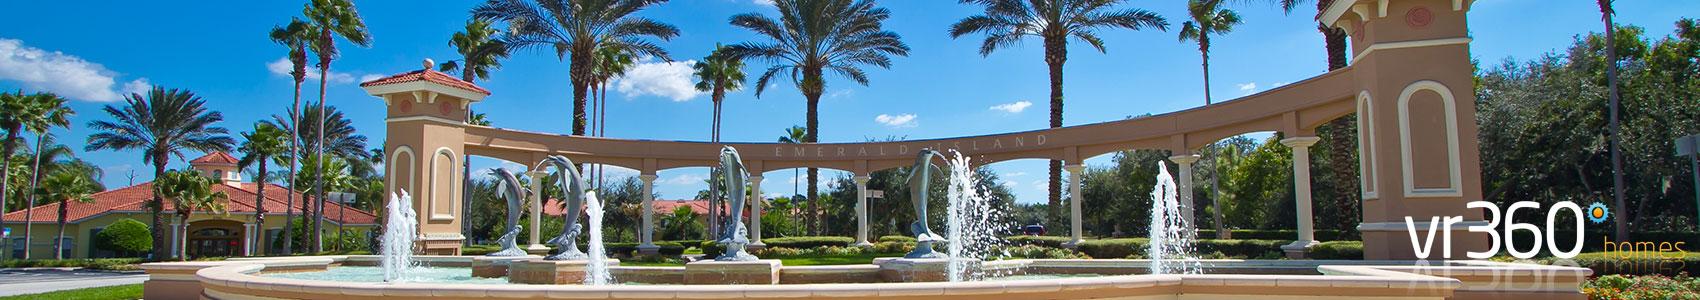 Emerald Island Resort Vacation Rentals and Villas in Kissimmee, Florida